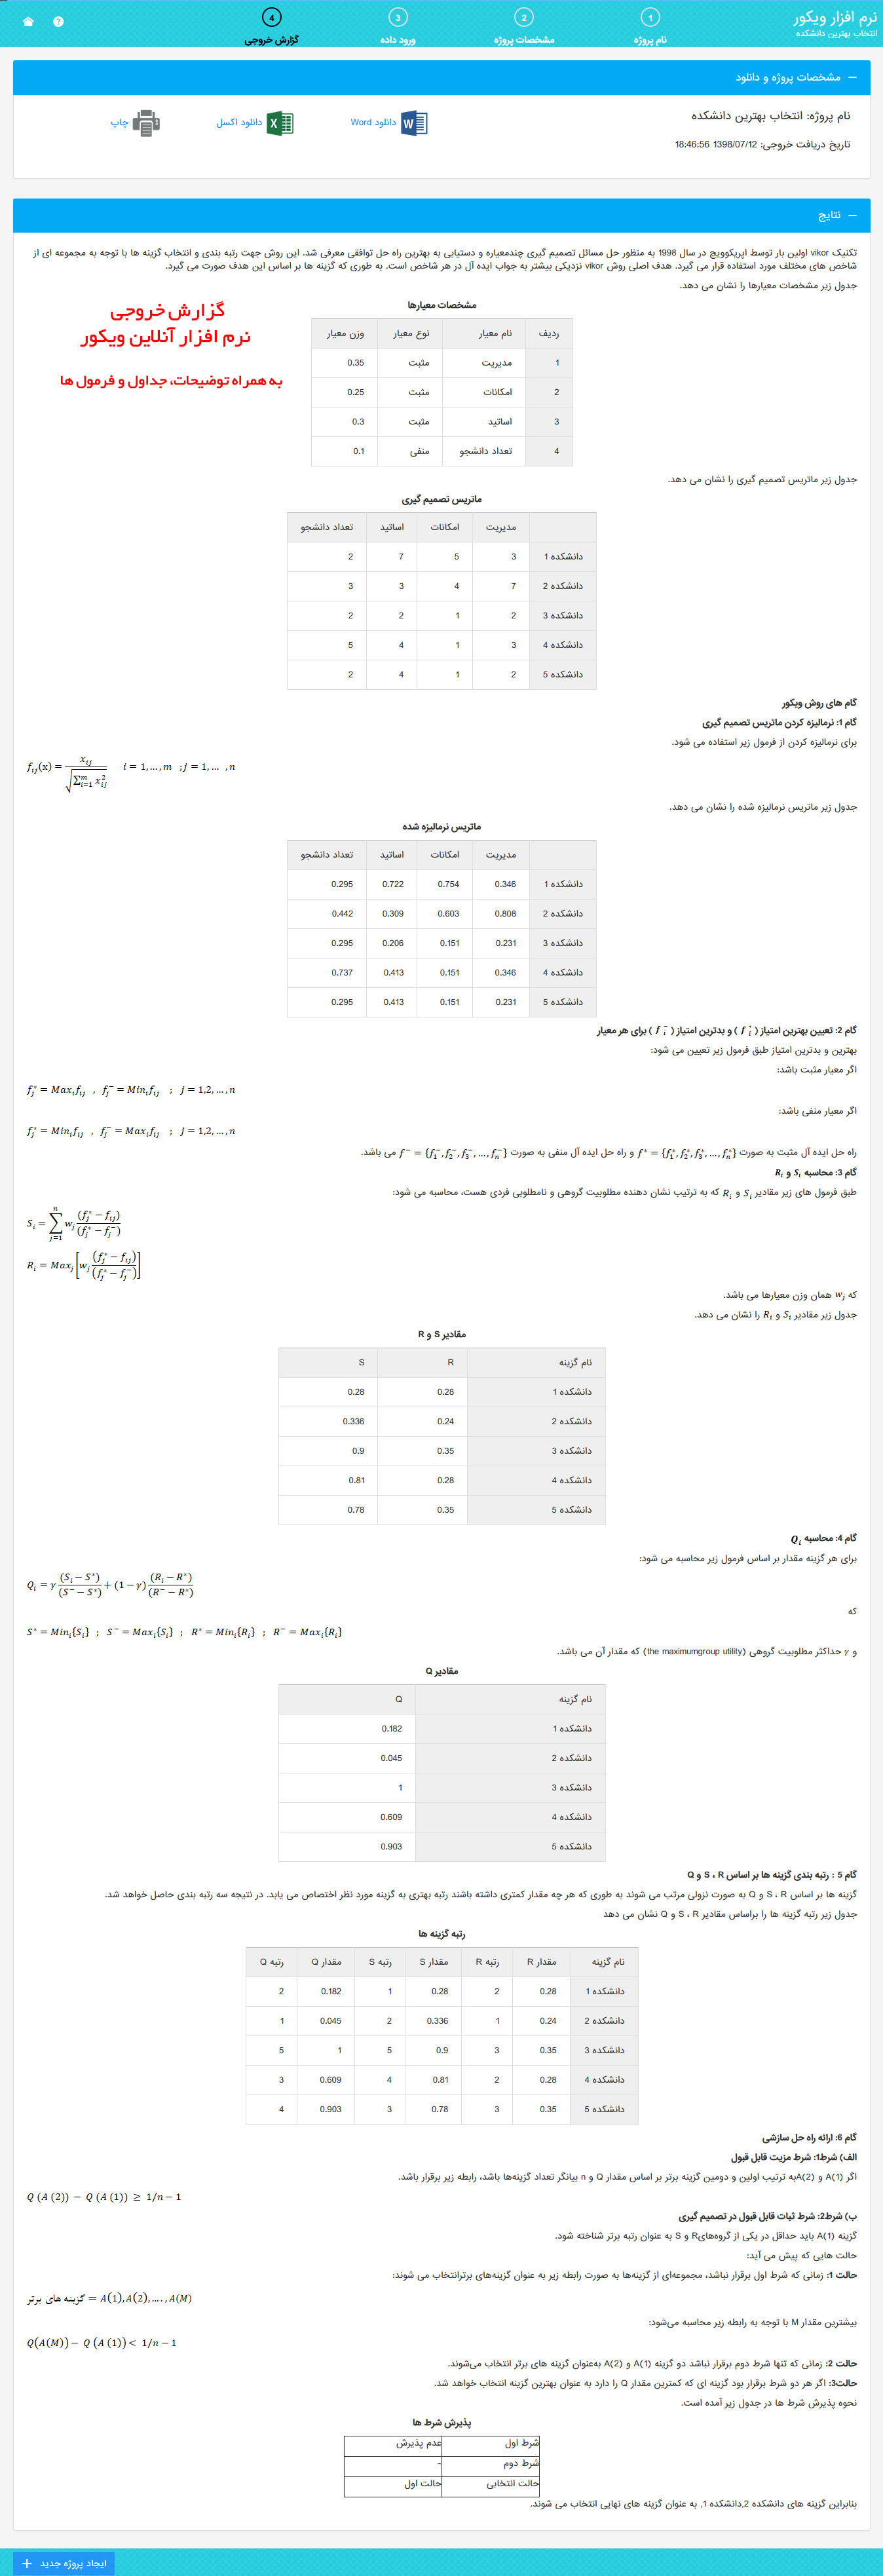 نرم افزار ویکور - گزارش خروجی